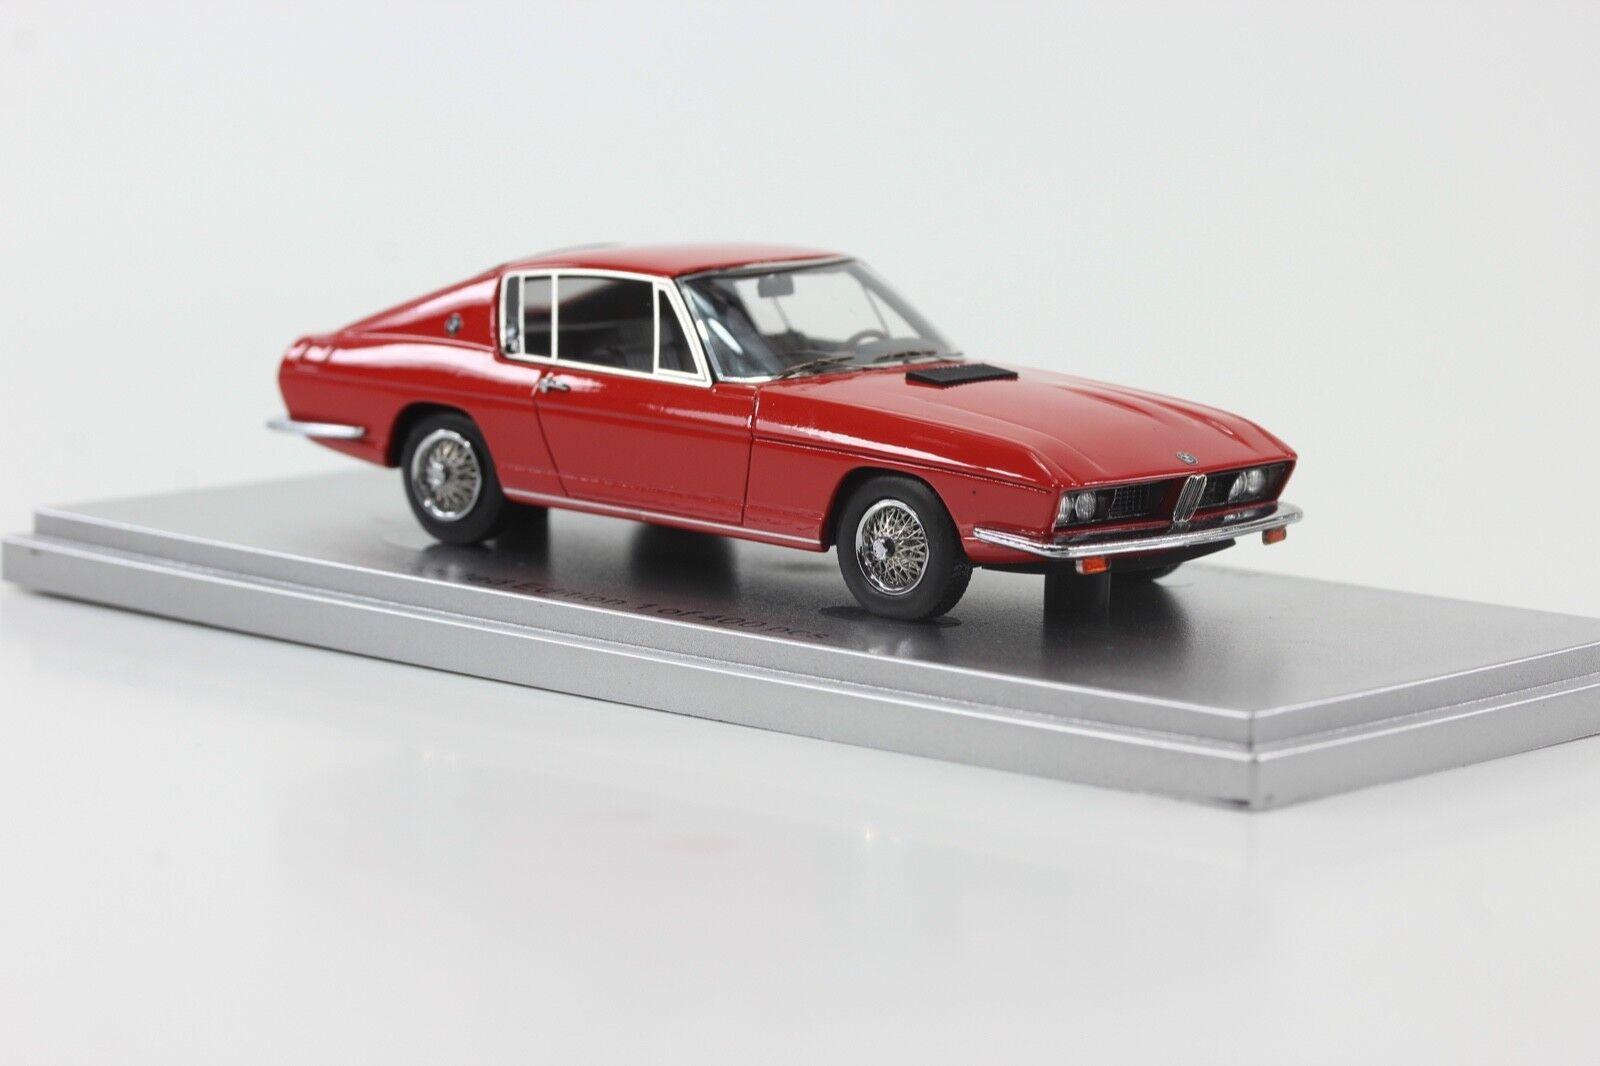 Bmw 2000 ti coupé frua 1968 1 43 kess 43035000 verrotten